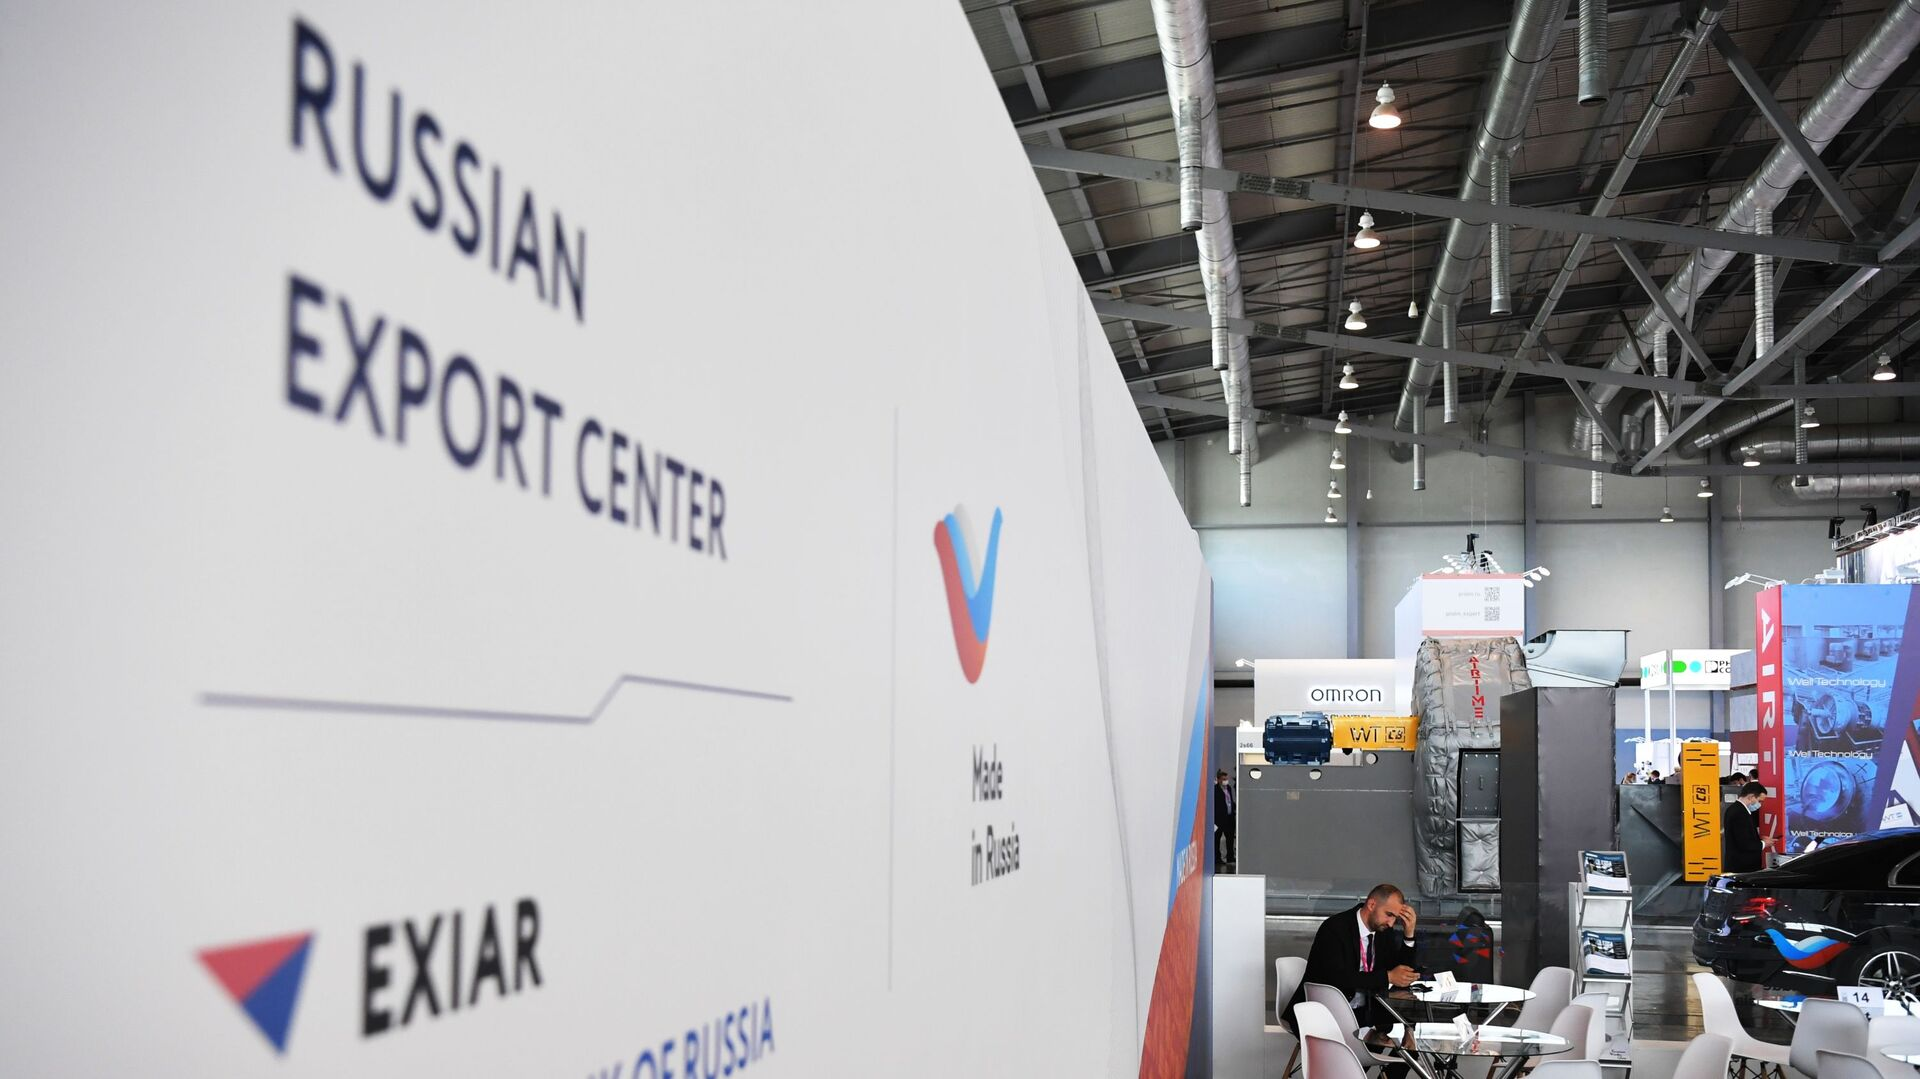 Russian Export Centre - Sputnik International, 1920, 28.07.2021